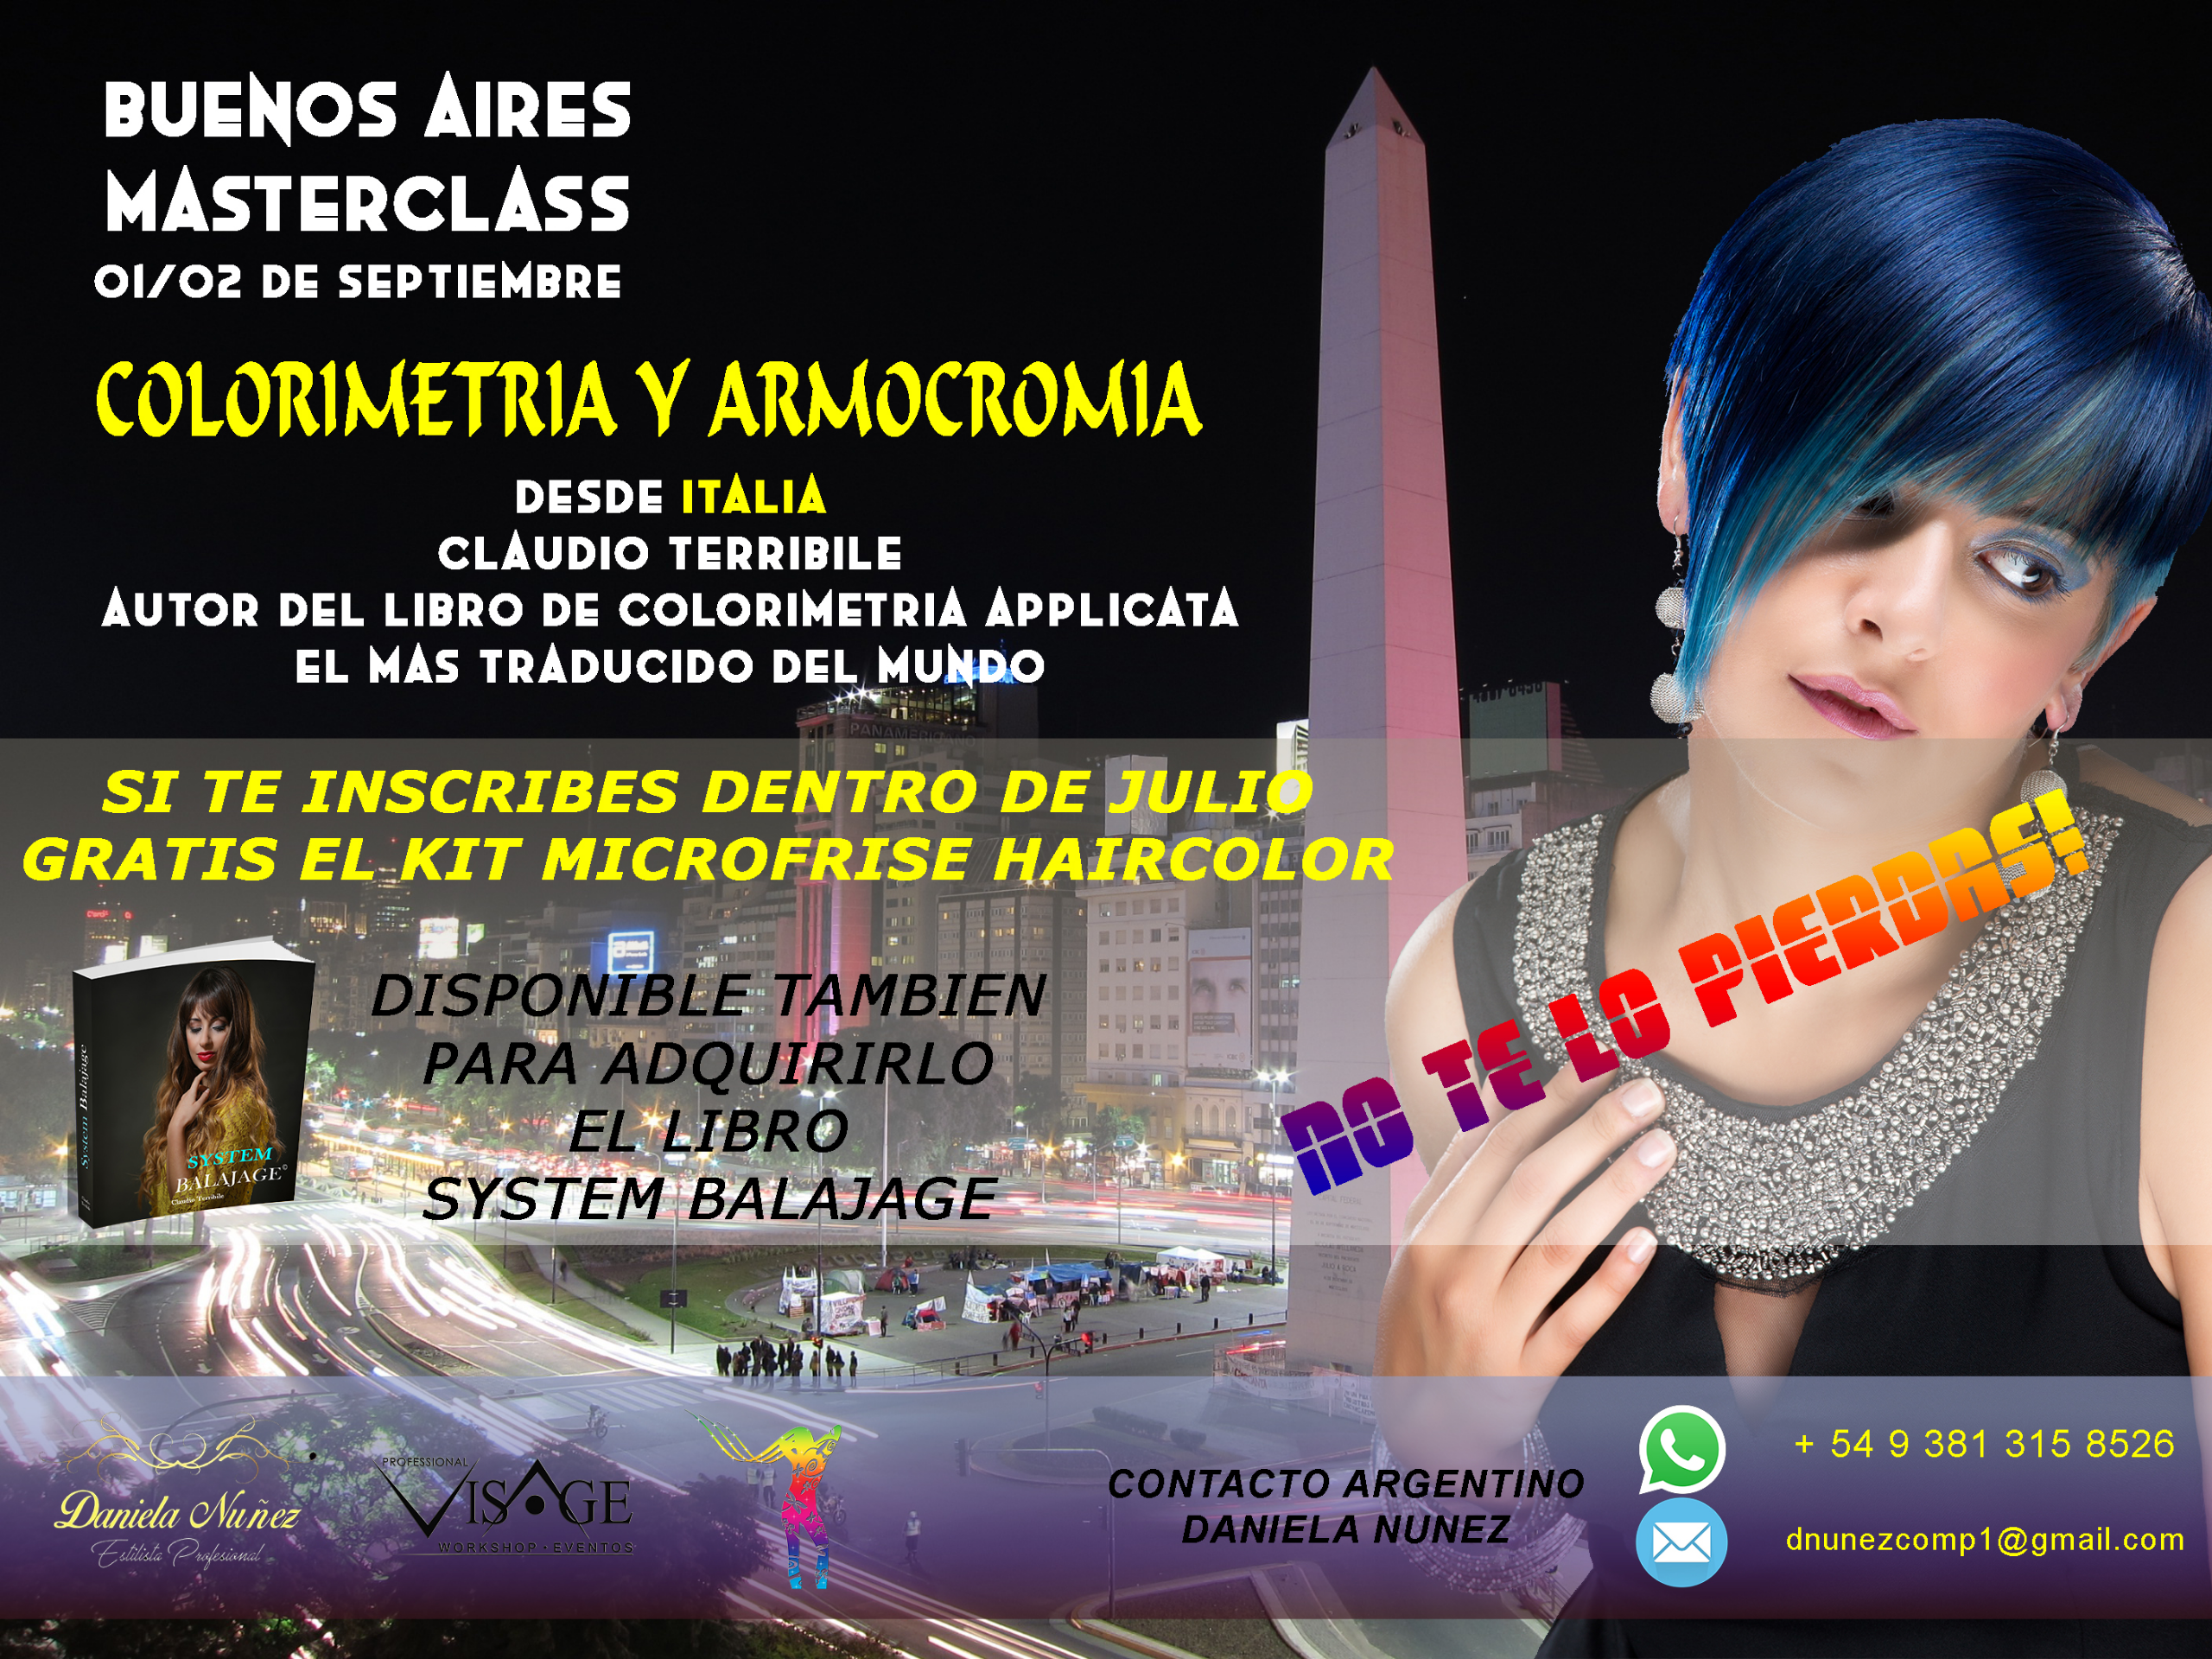 BUENOS AIRES MASTERCLASS CLAUDIO TERRIBILE 01/02 SEPTEMBER 2019